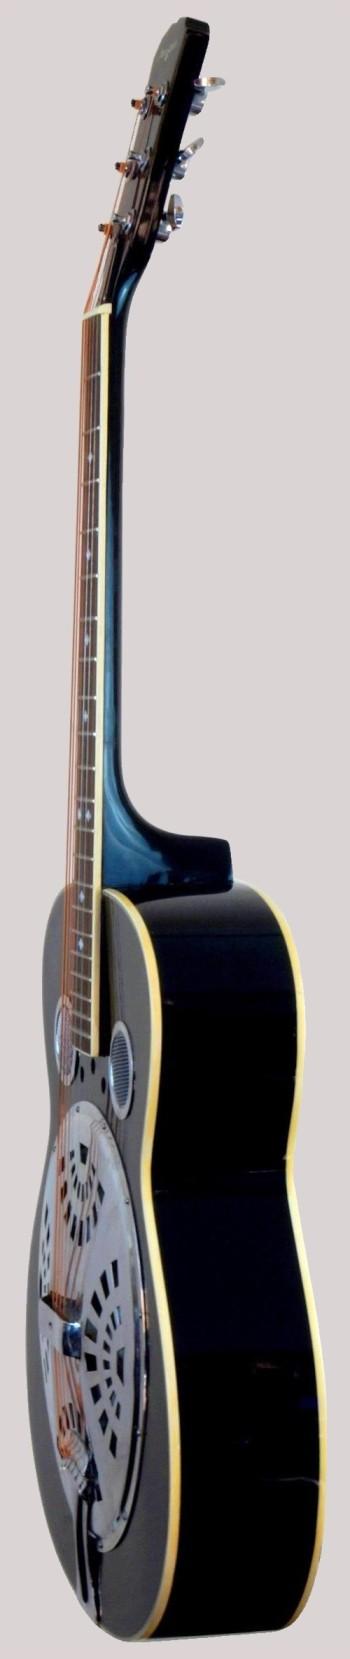 Aluminium single cone dobro resonator Guitar